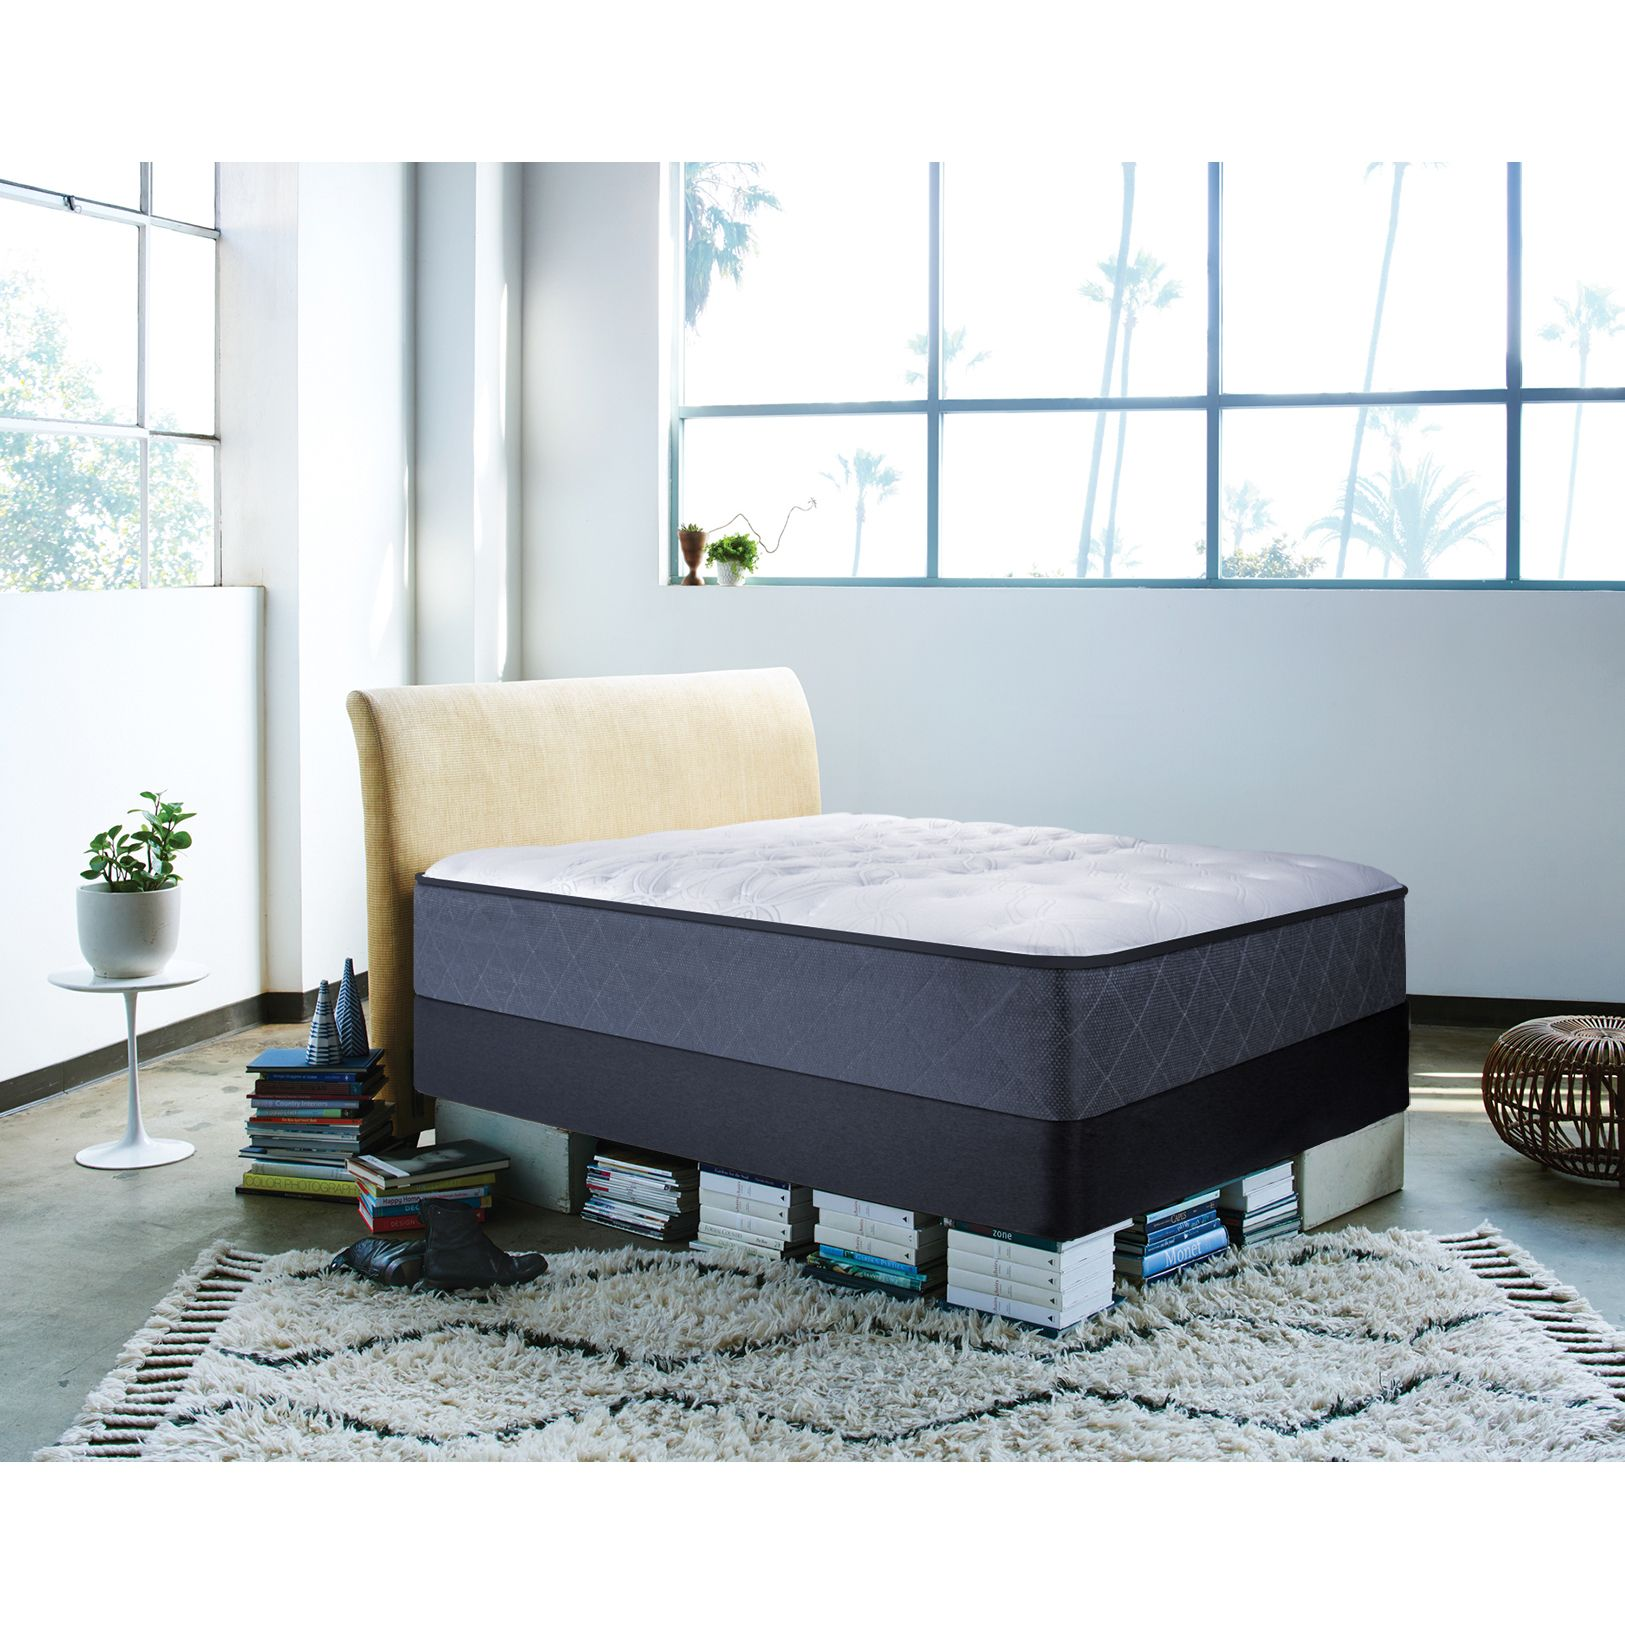 Sealy Posturepedic Happy Canyon Plush Full-size Mattress Set ...